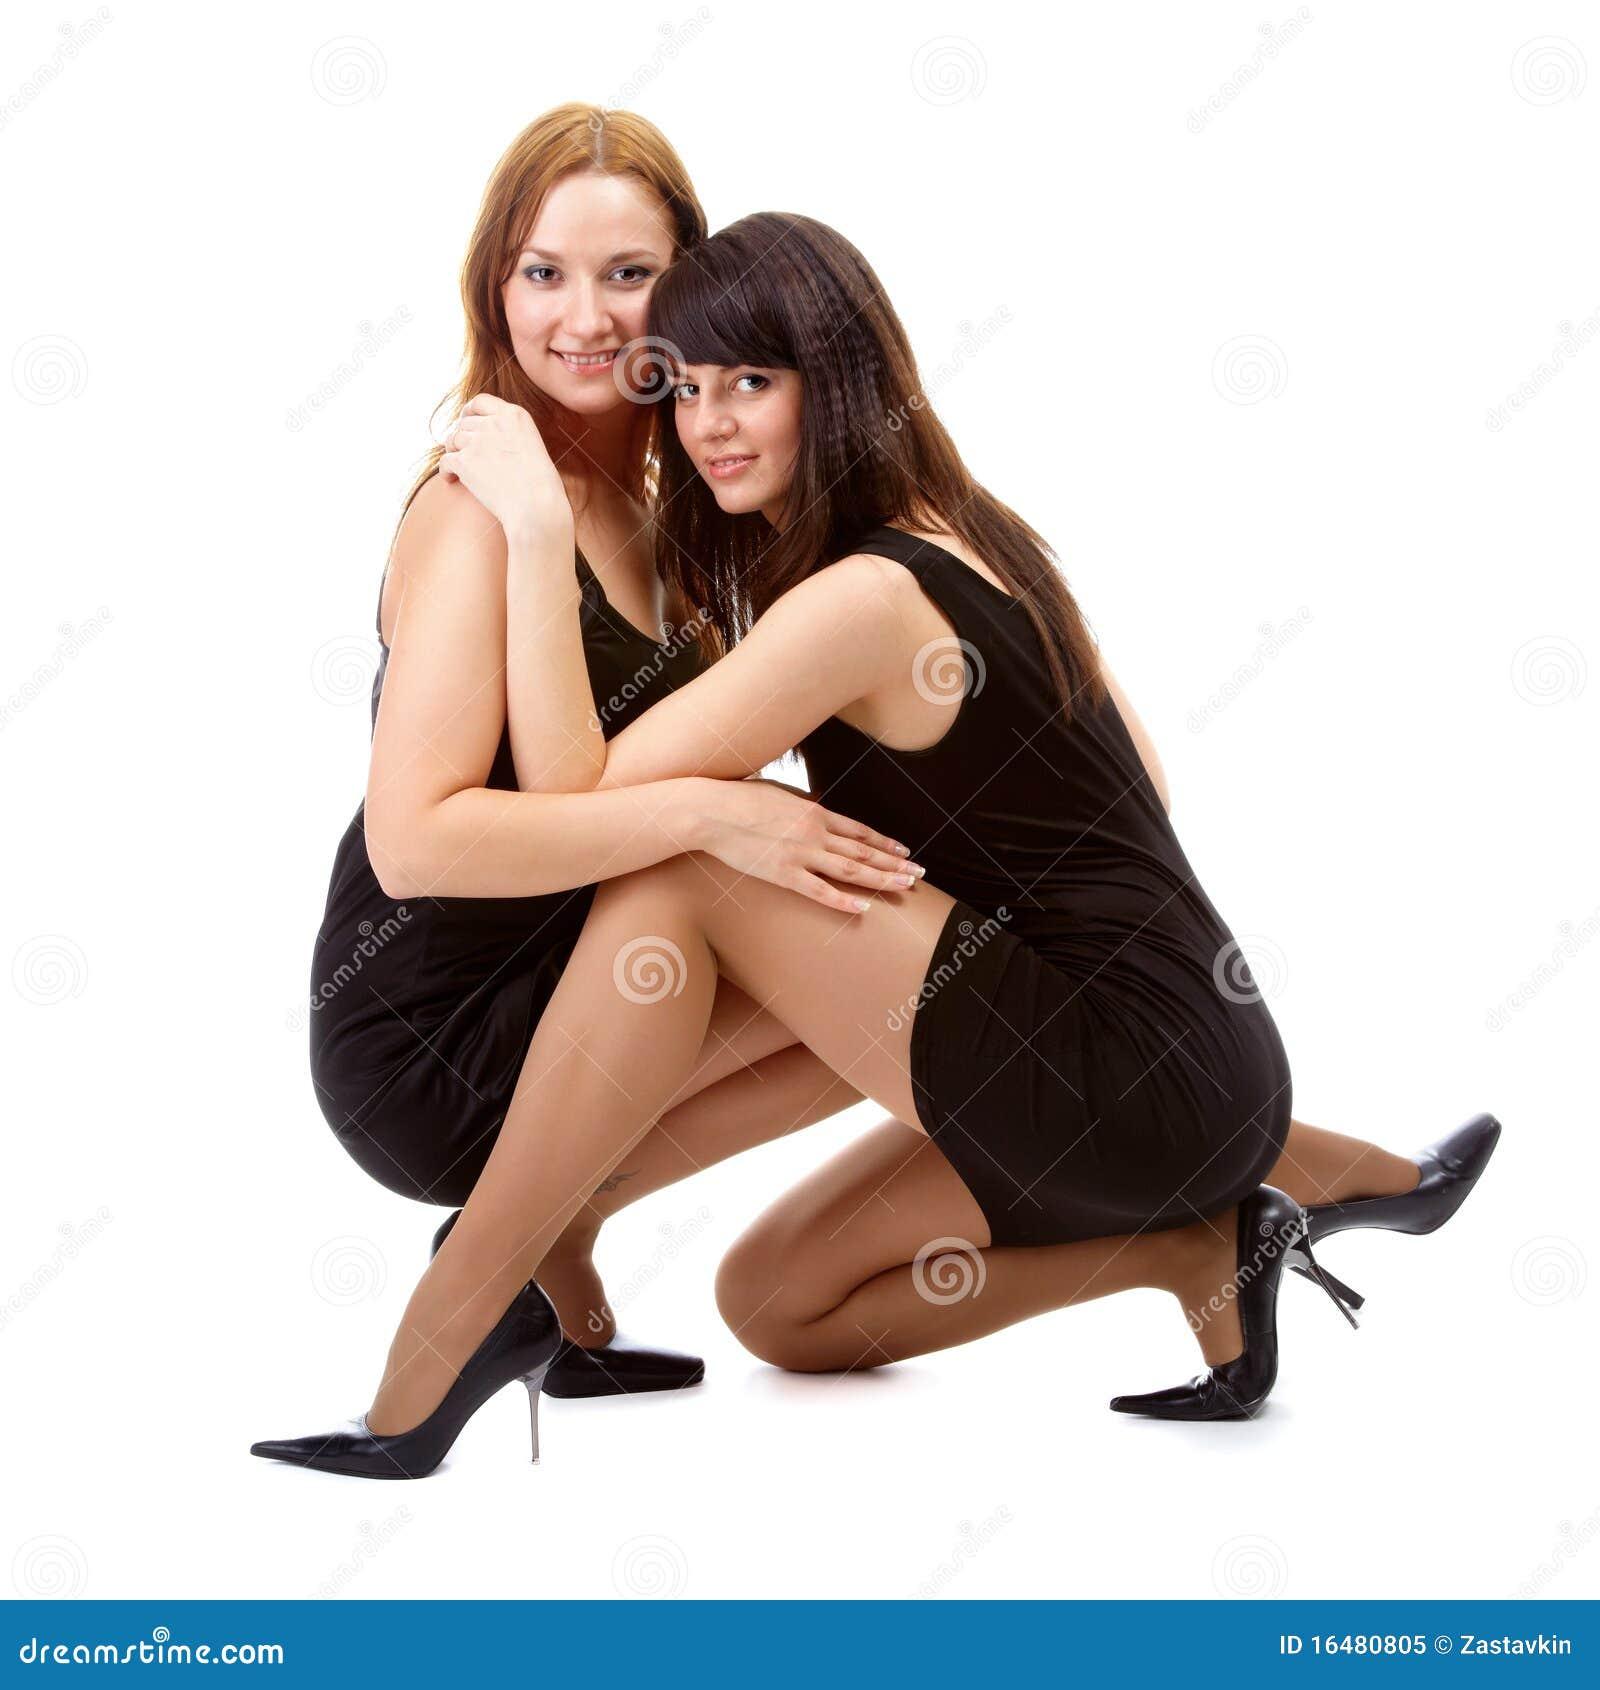 little pantyhose models Pantyhose fetish – The ActSensuous Blog